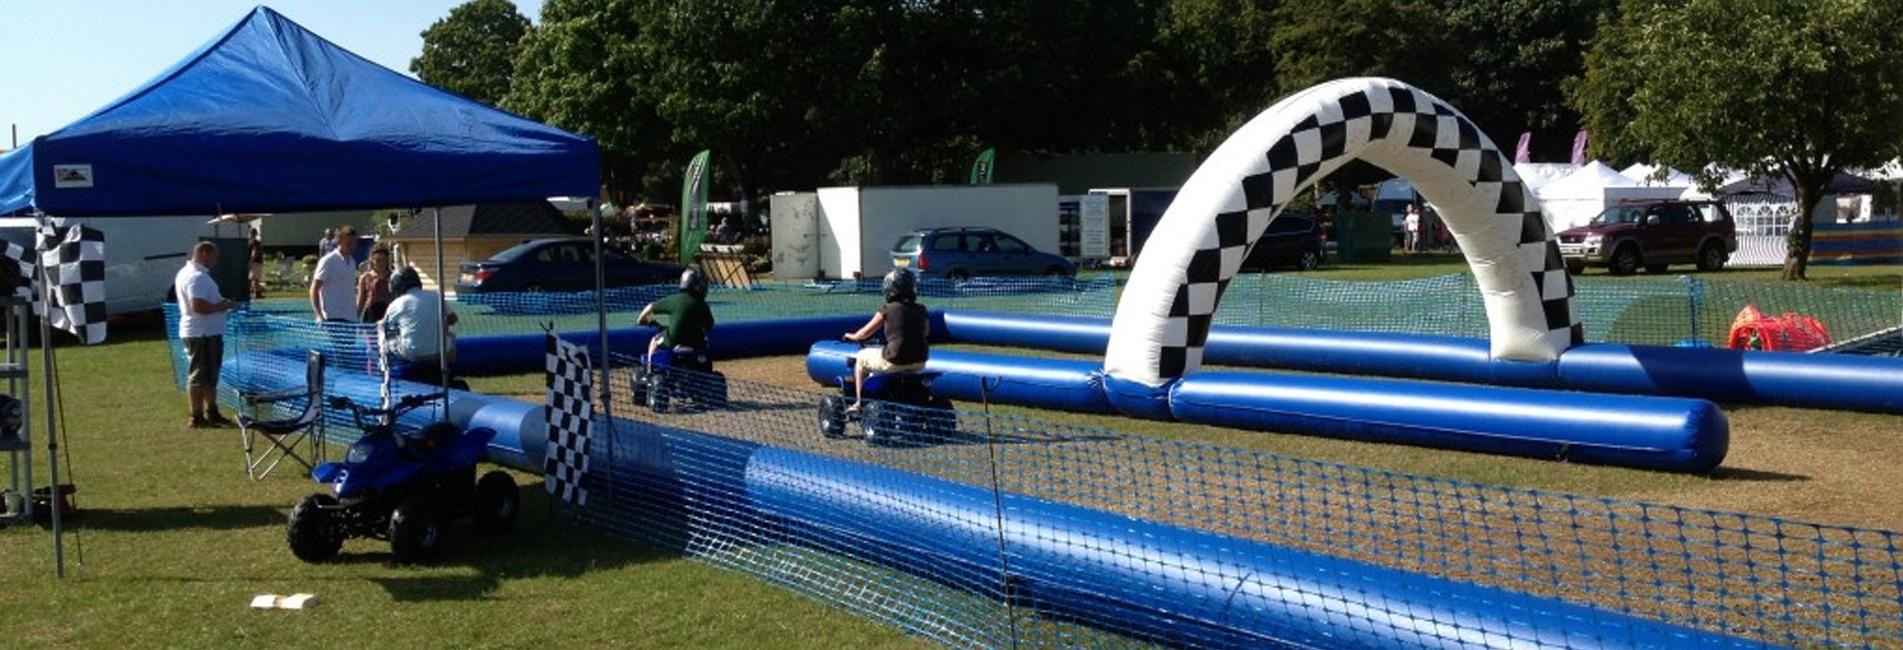 Kids Racing Quad Bikes Outdoors